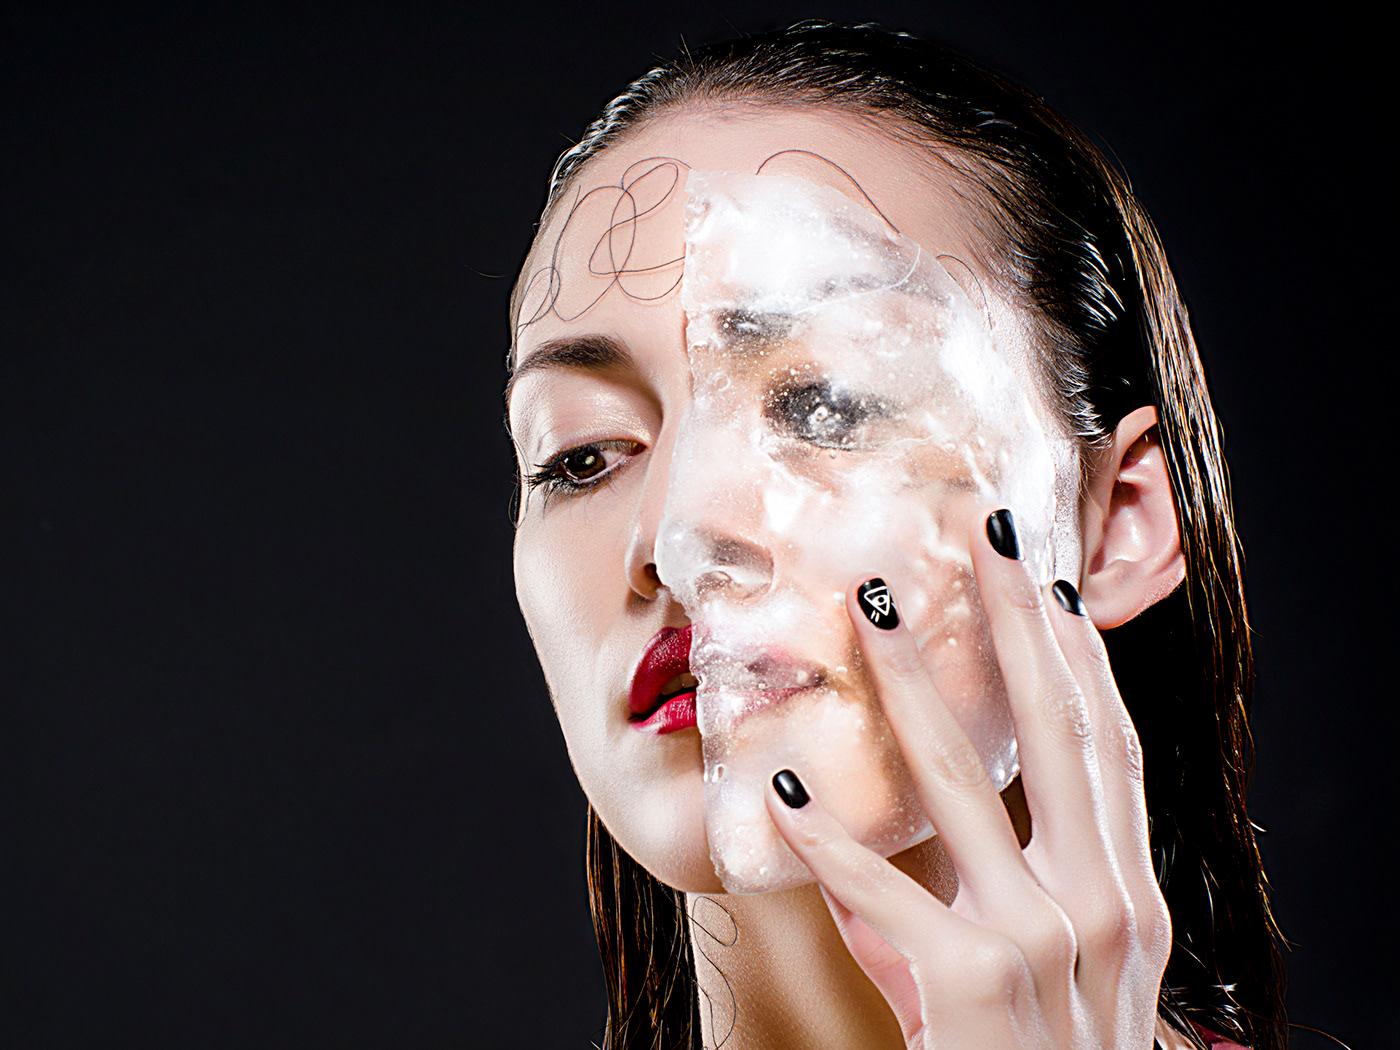 makeup MUA glamour beauty skin